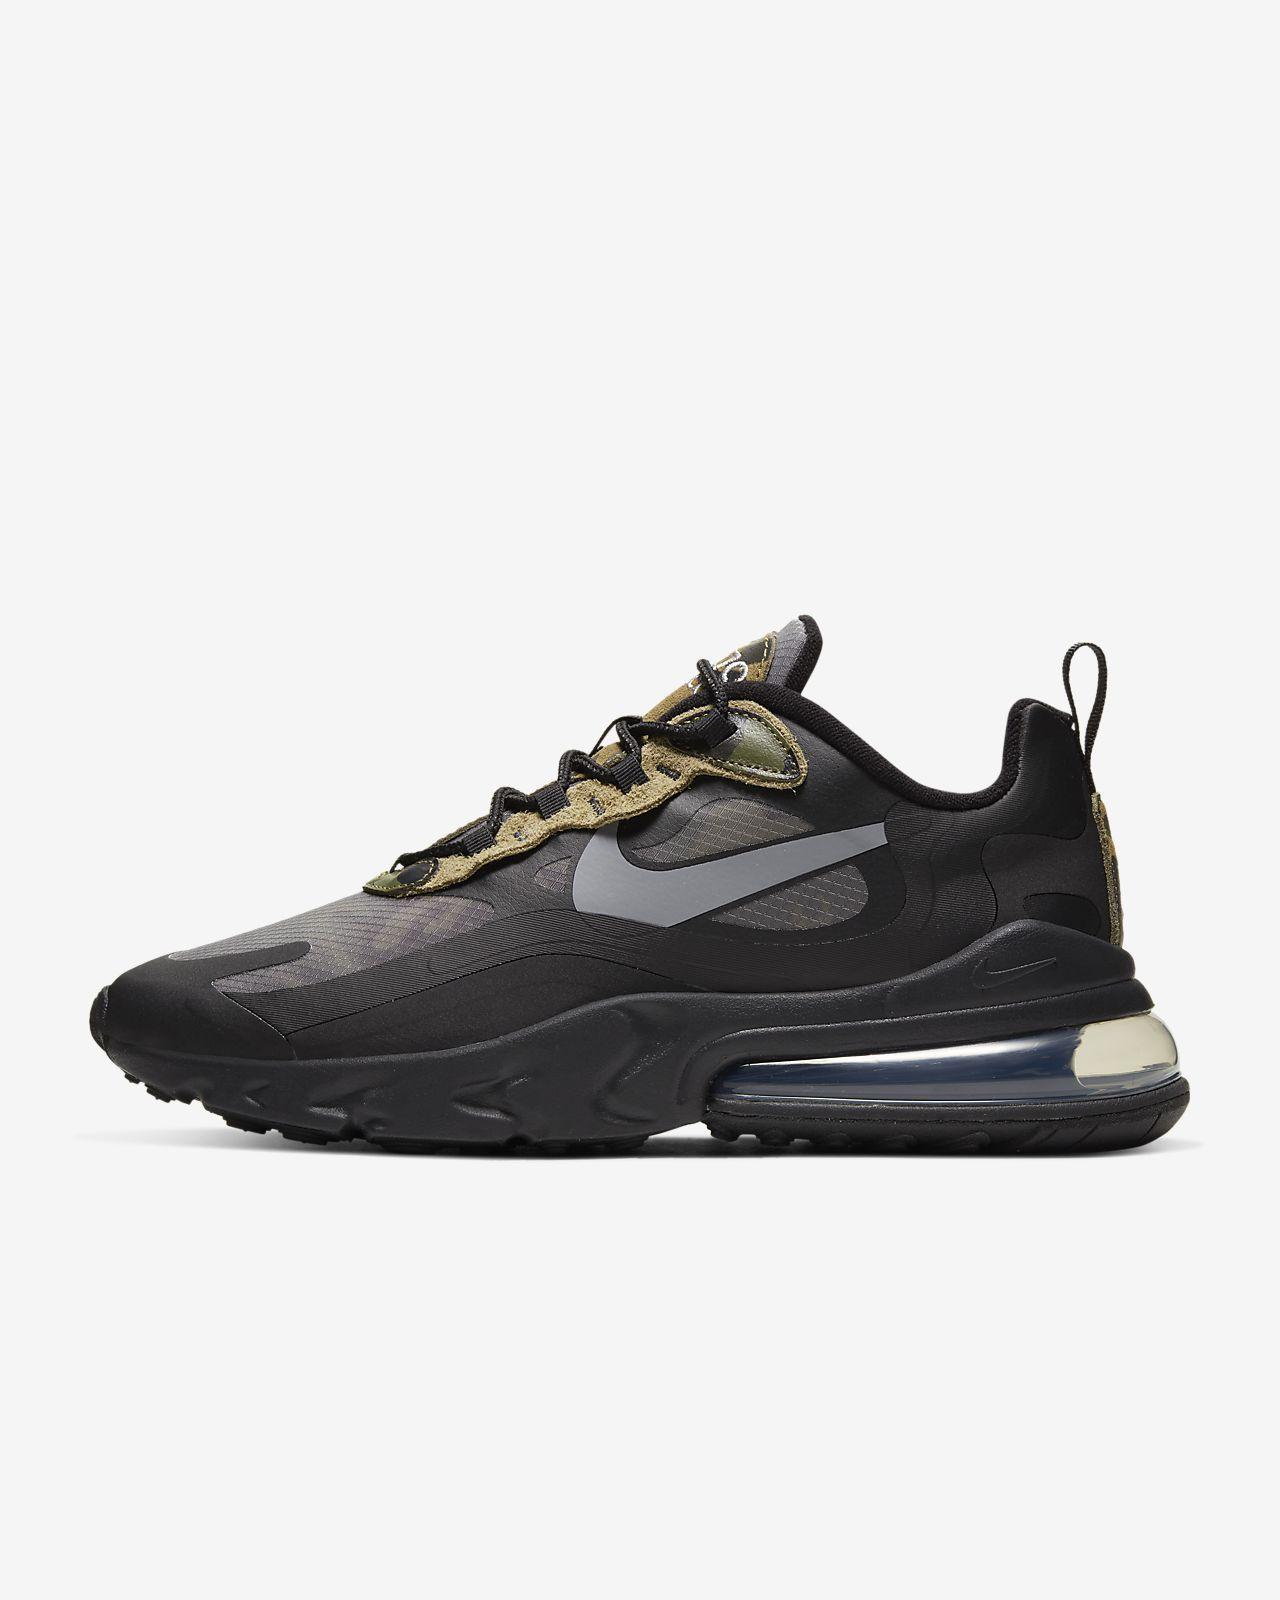 Chinelo Nike Air Max | Sandália Masculina Nike Nunca Usado